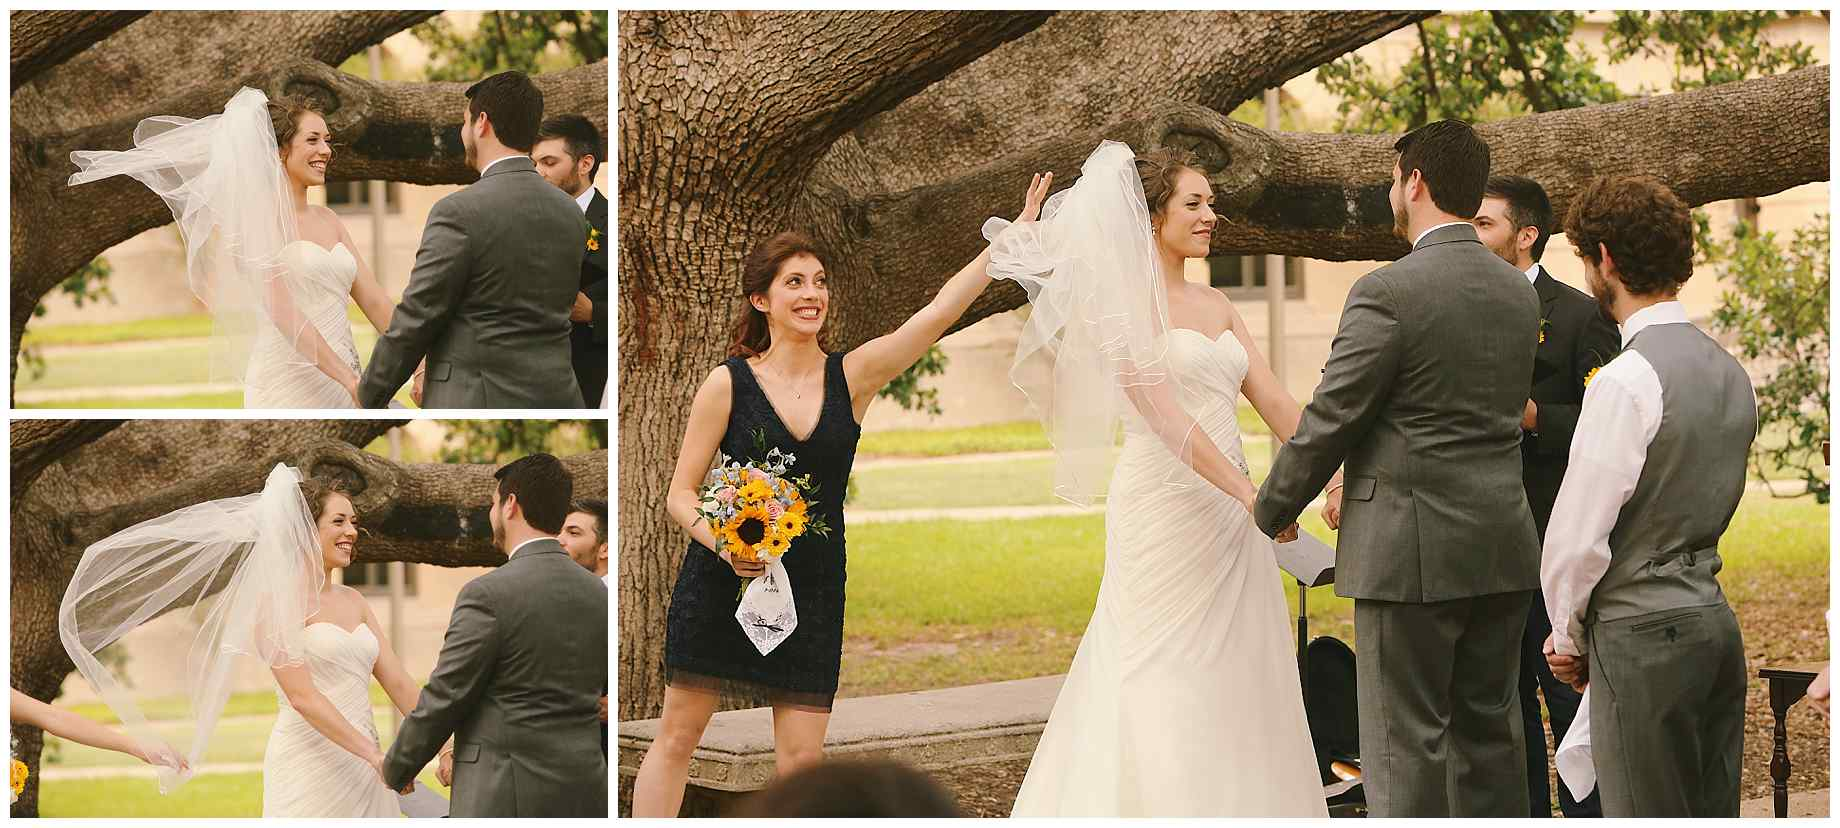 aggie-century-tree-wedding-15